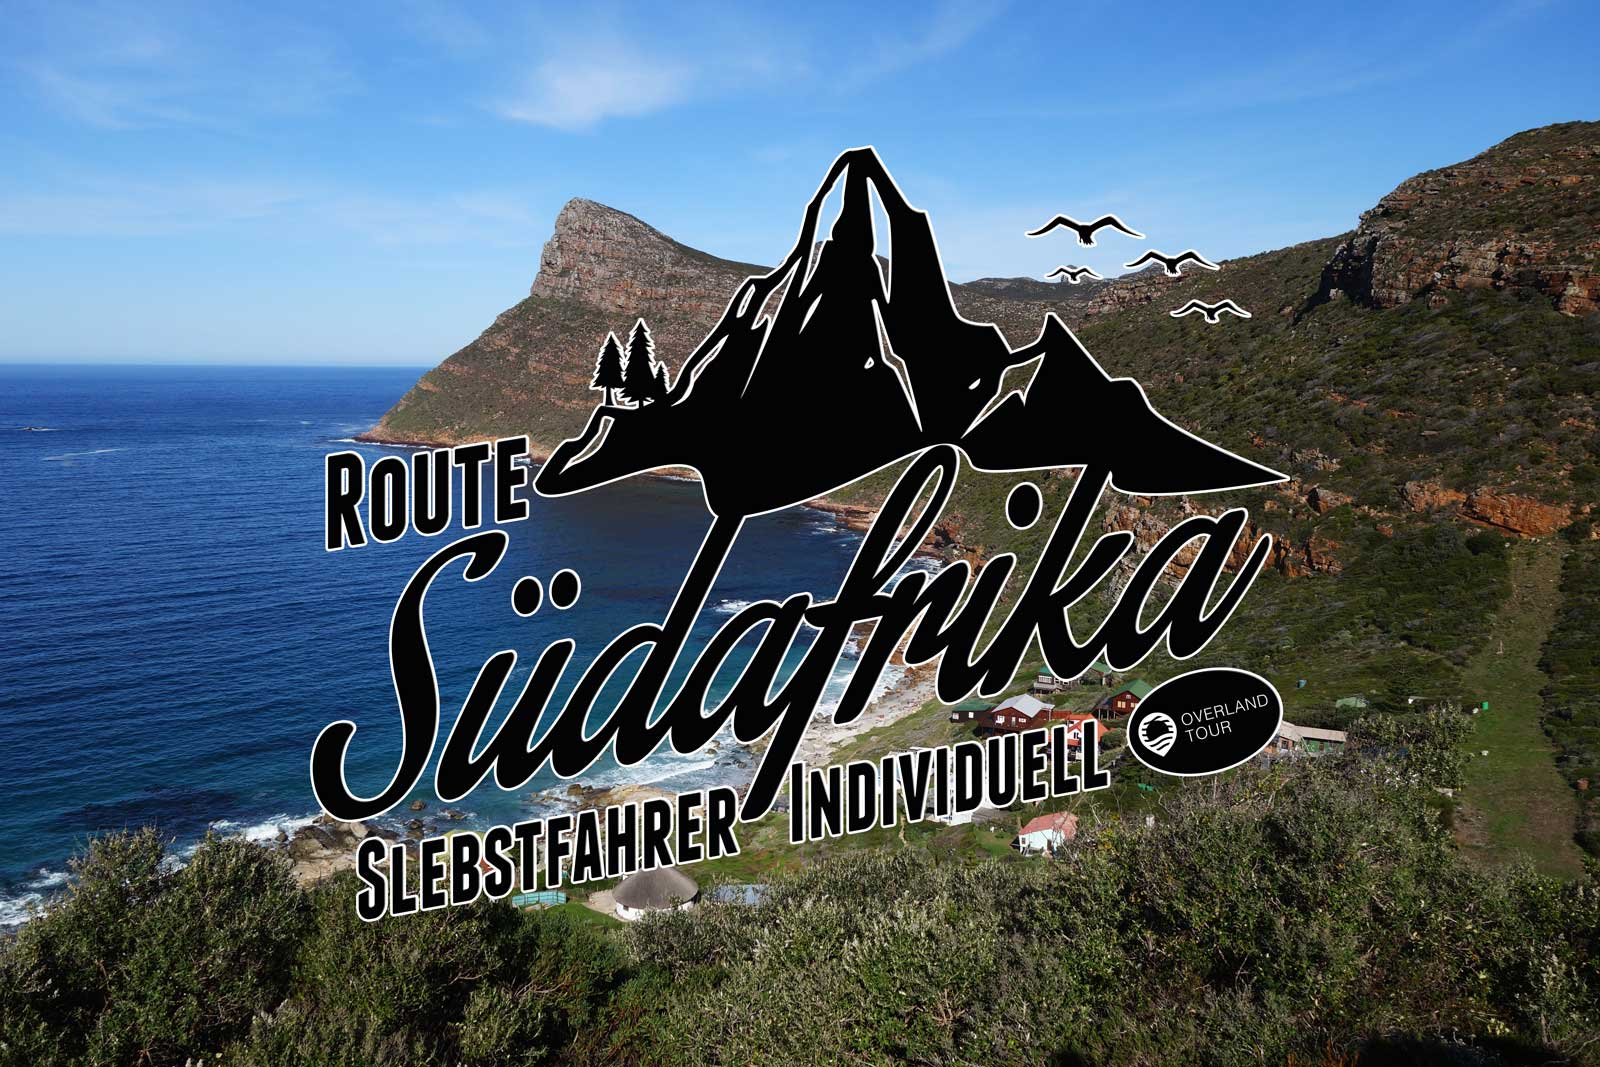 Südafrika Tour individuell für Selbstfahrer